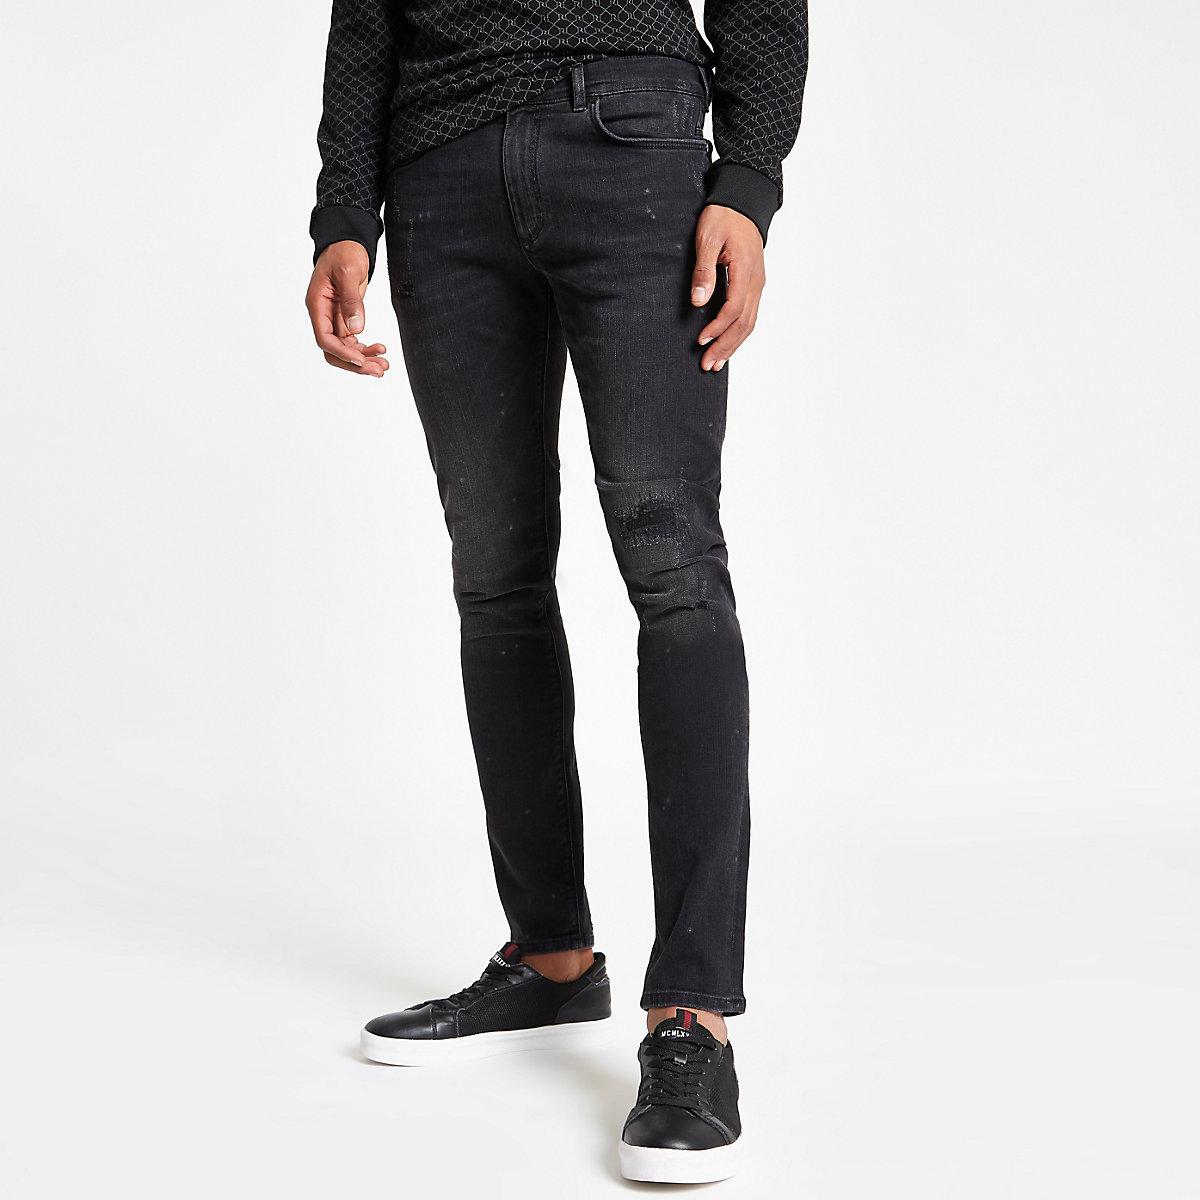 Black wash Sid ripped skinny jeans